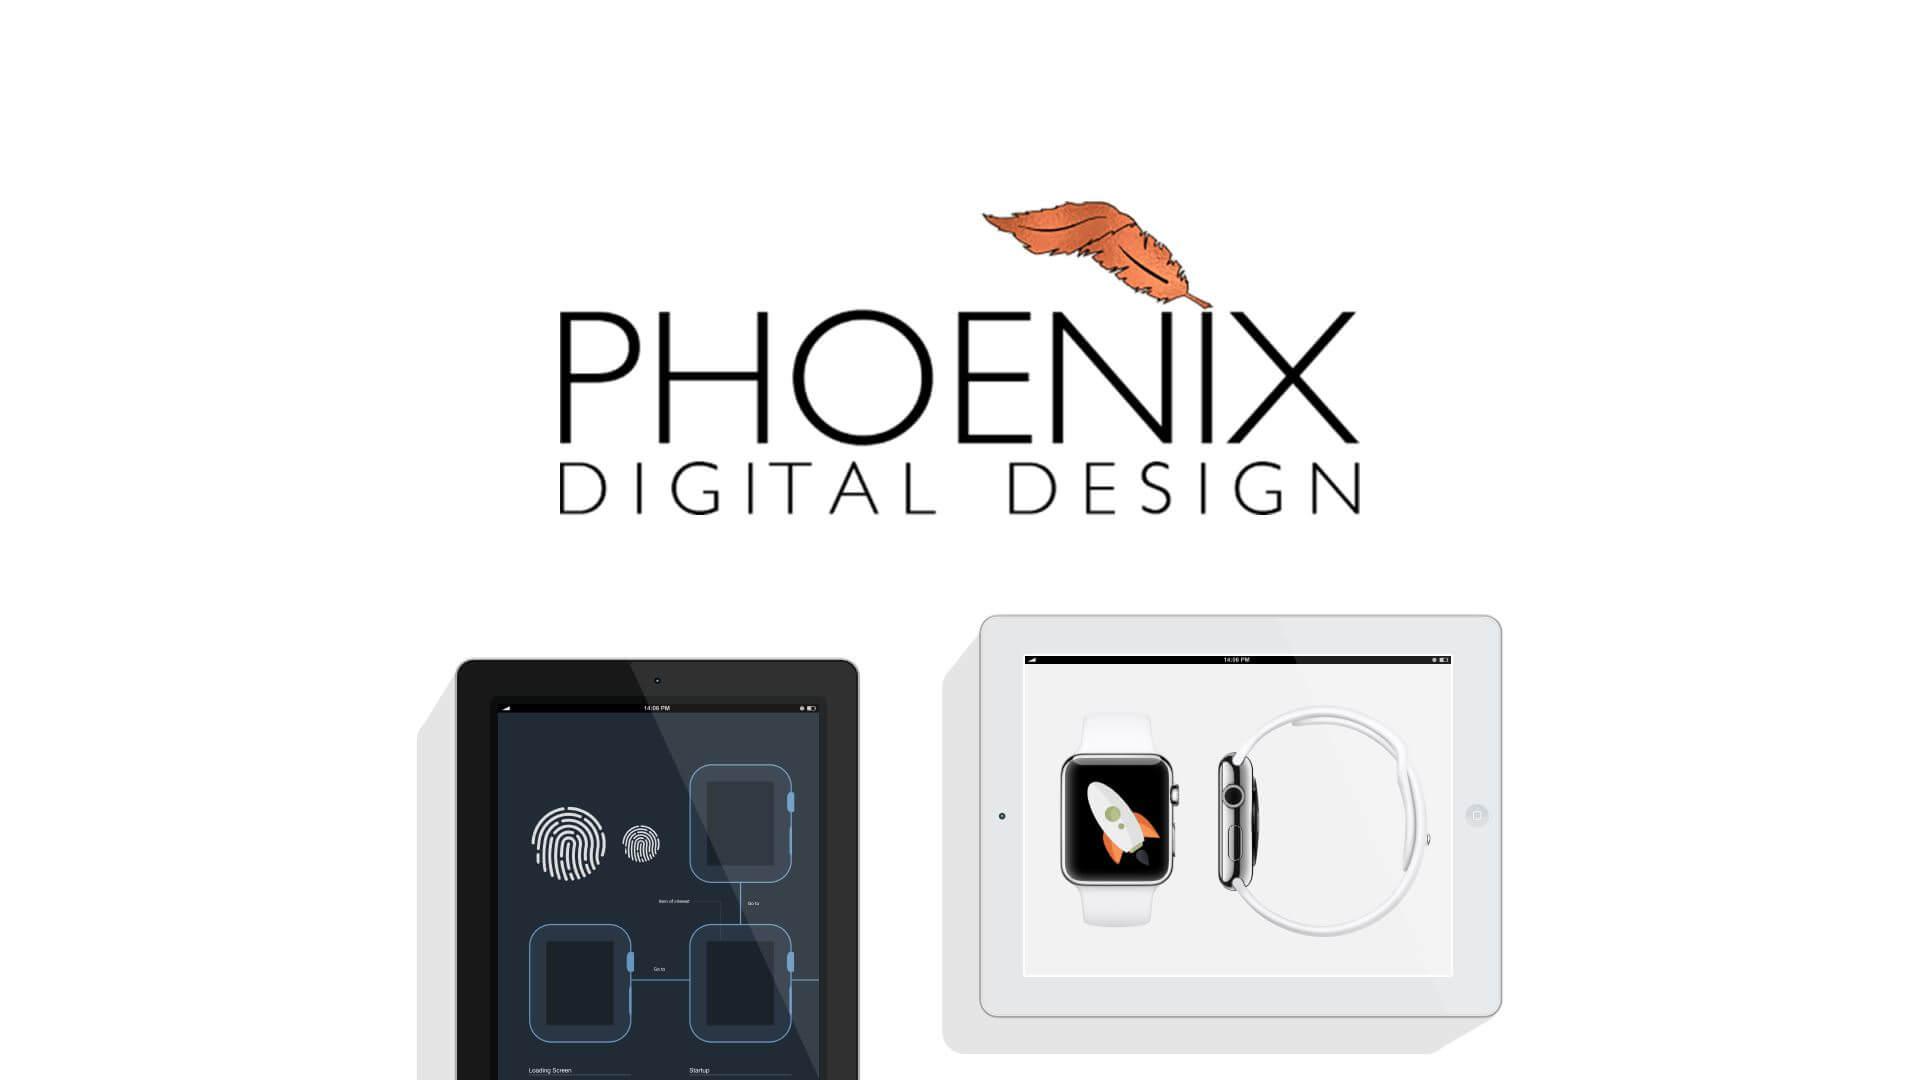 Phoenix Digital Design